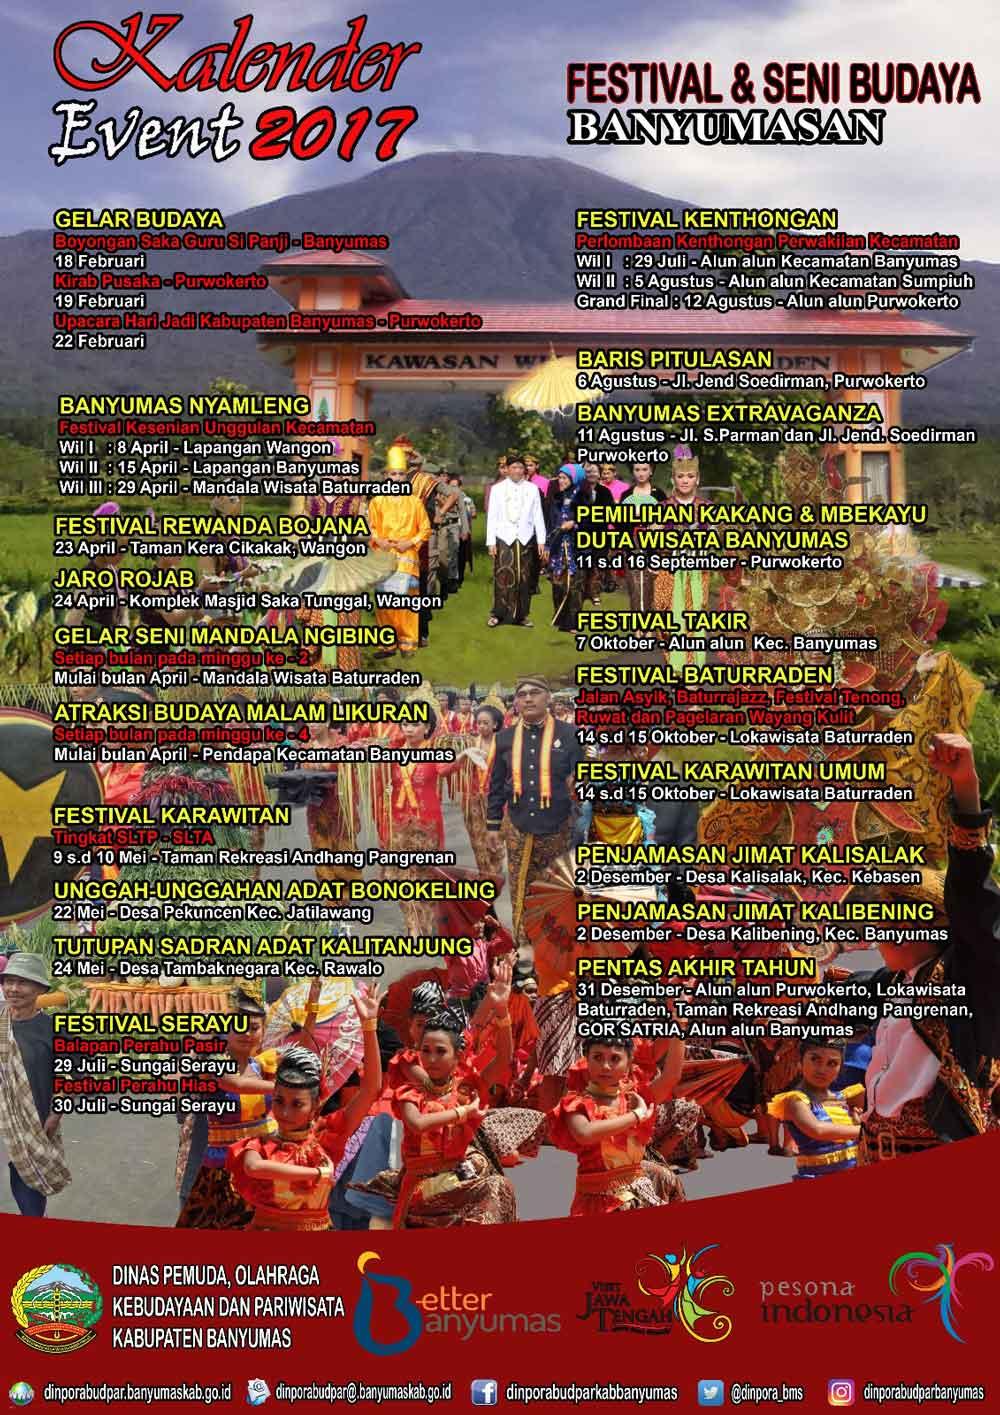 Kalender Event Banyumas 2017 Purwokerto Guidance Alun Kab